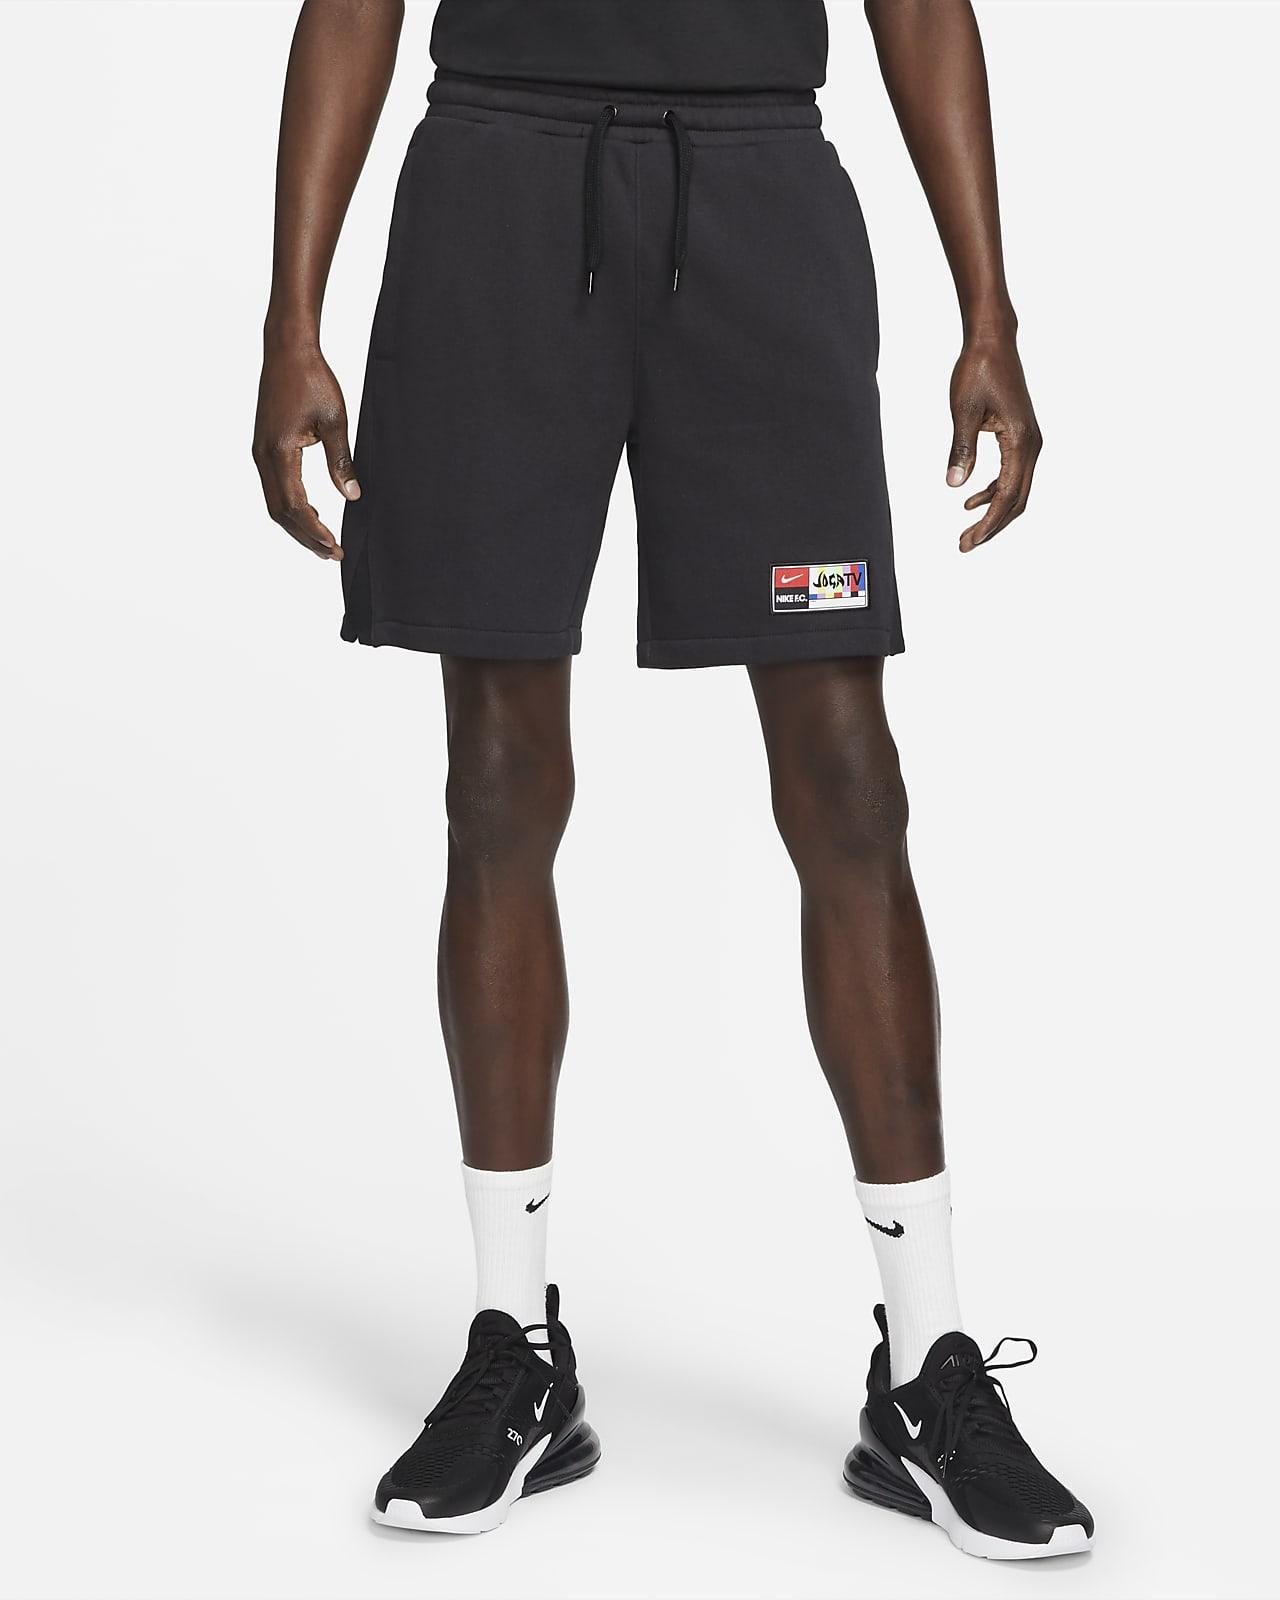 Nike F.C. Men's Fleece Football Shorts